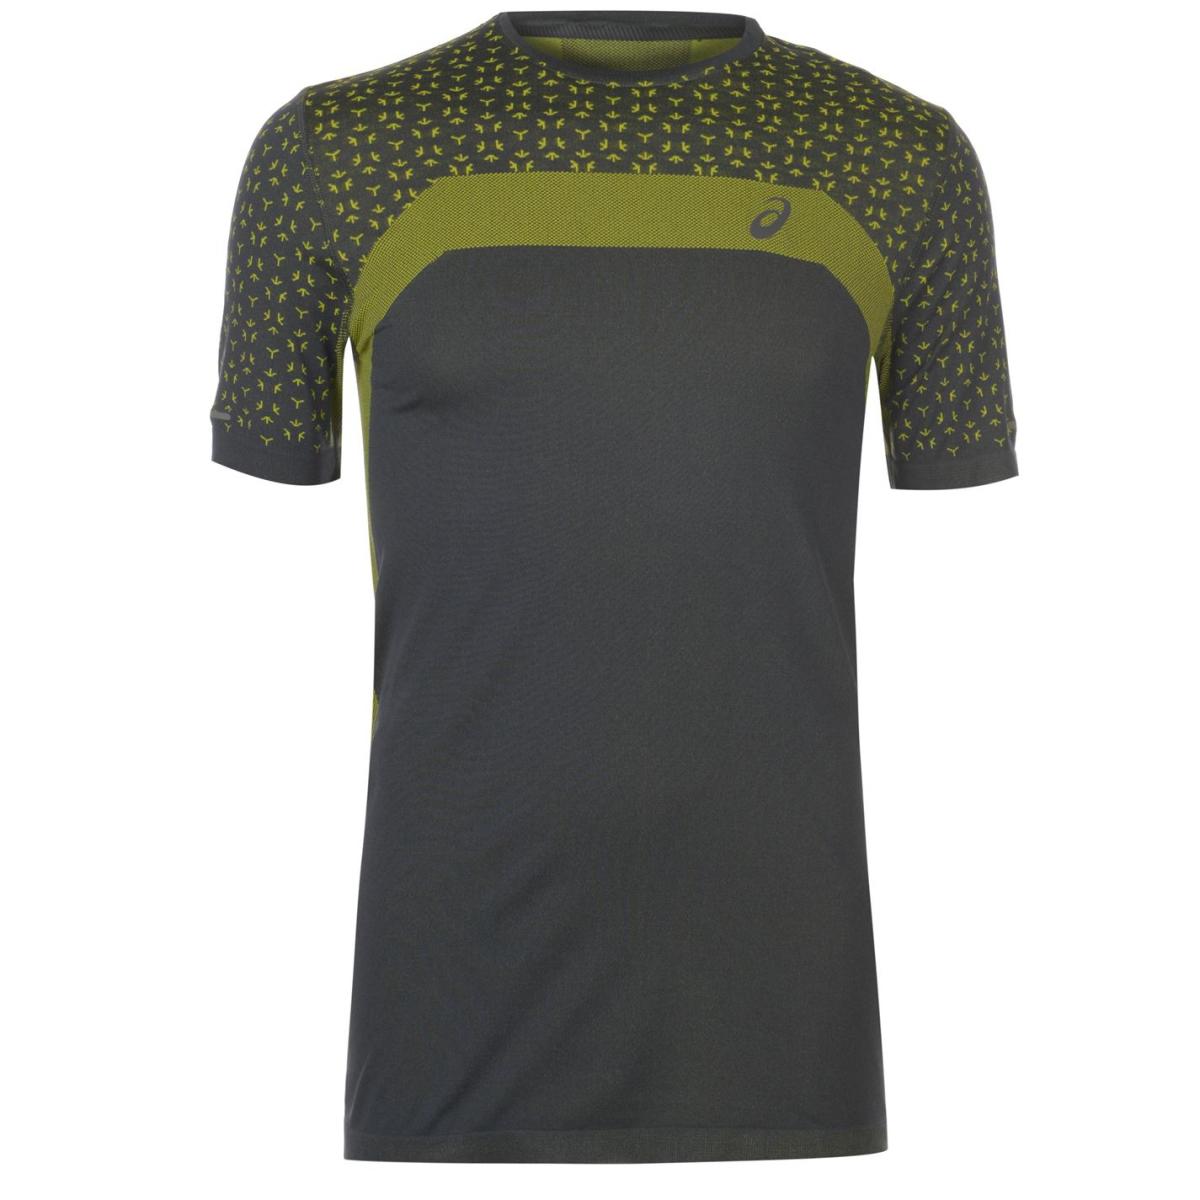 Asics T-Shirt Herren Sportshirt TShirt Kurzarm 1447